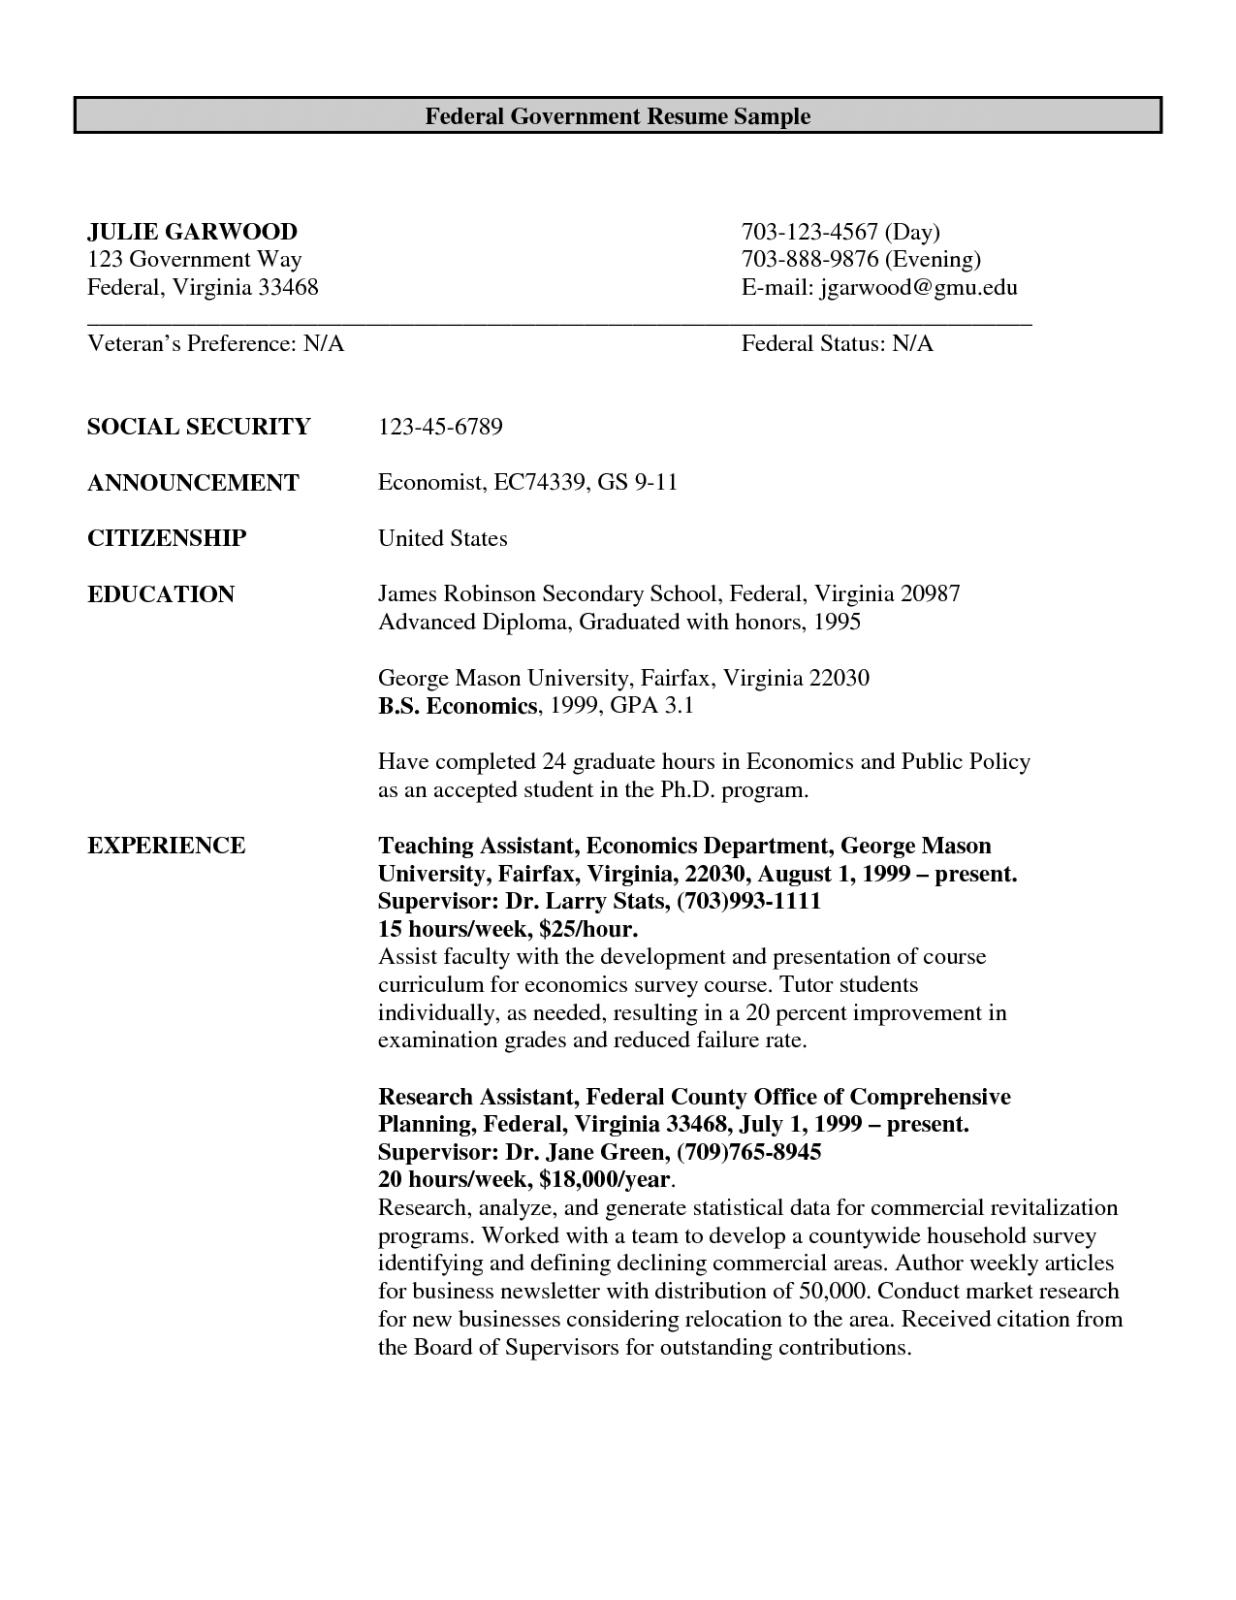 11 Resume Format For Authorities Job Philippines in 2020